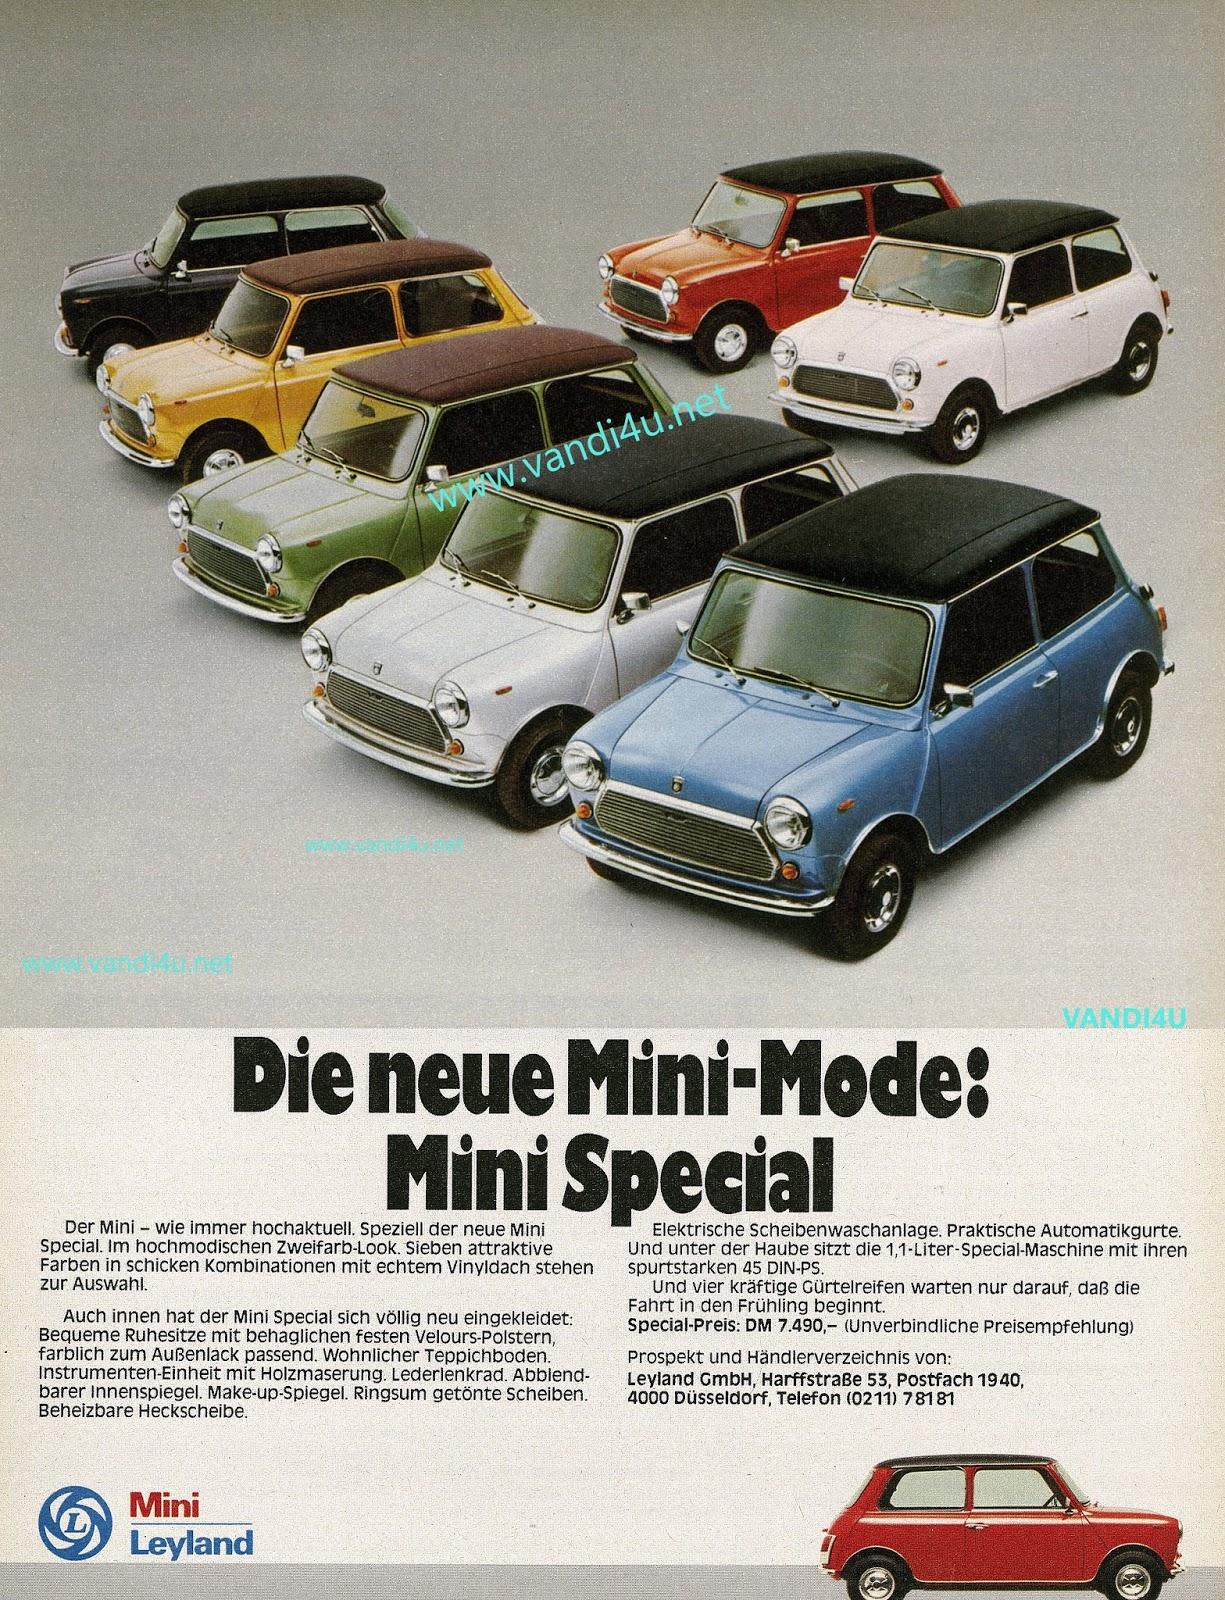 MINI Turns 60: Style Icon's Remarkable Journey Through The Years | VANDI4U